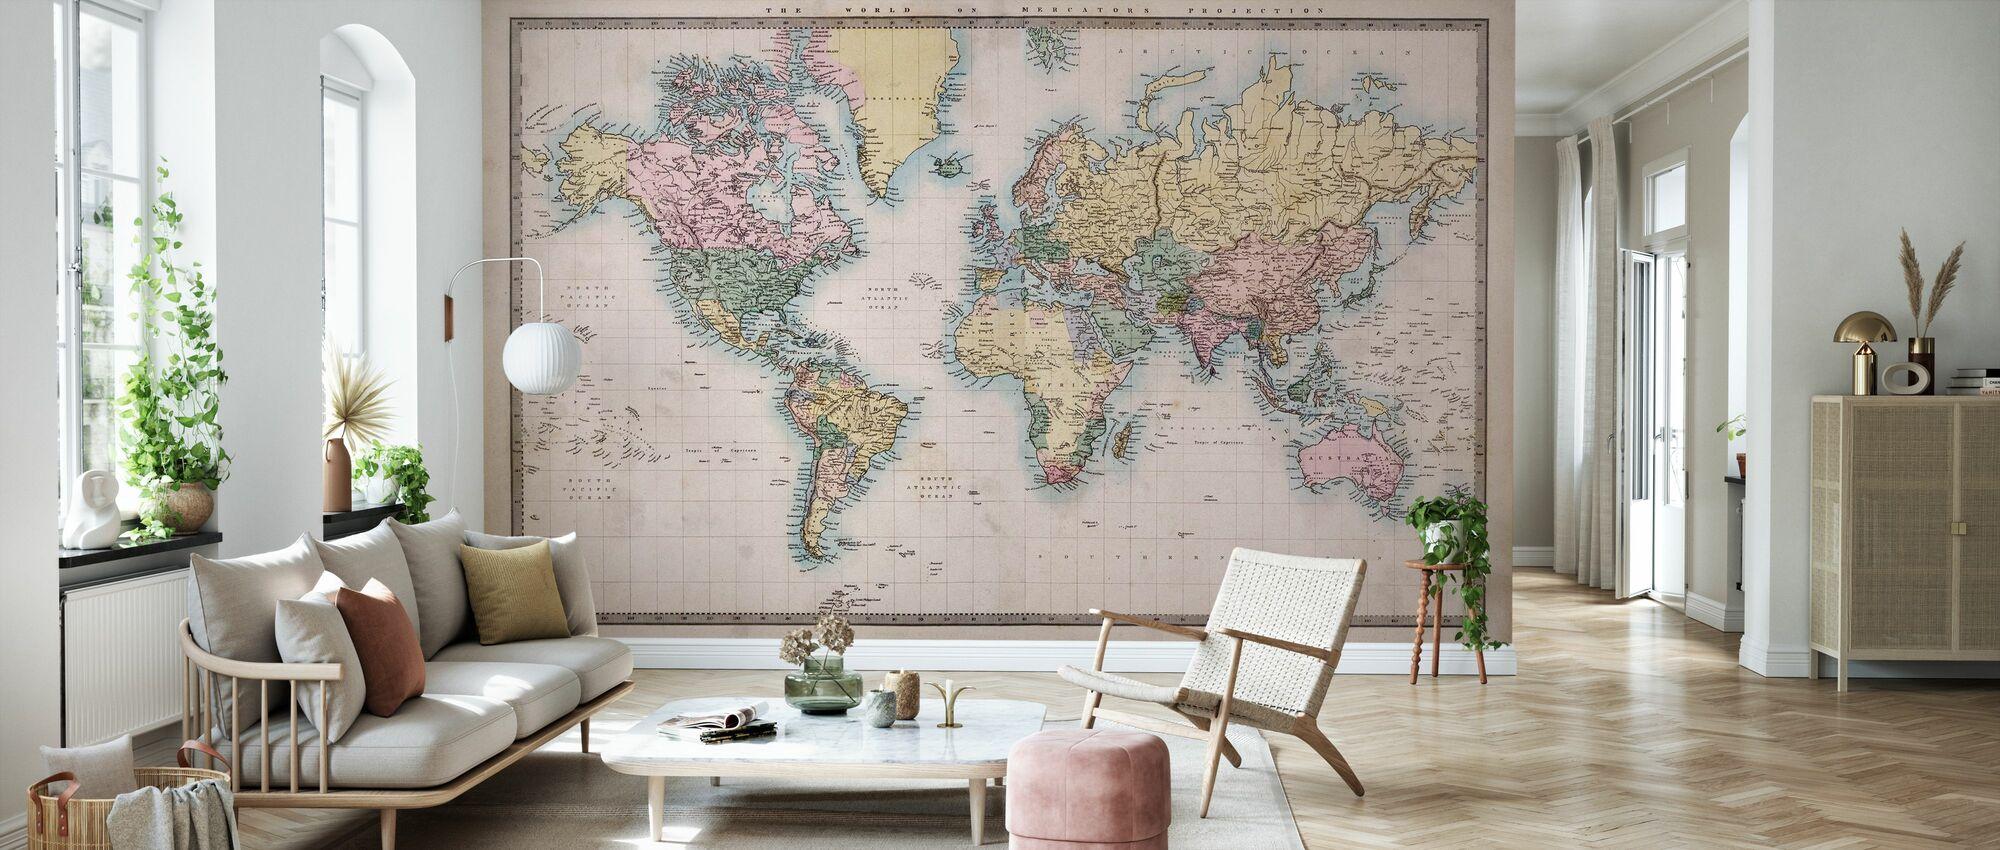 1860 Hand Coloured Map - Wallpaper - Living Room